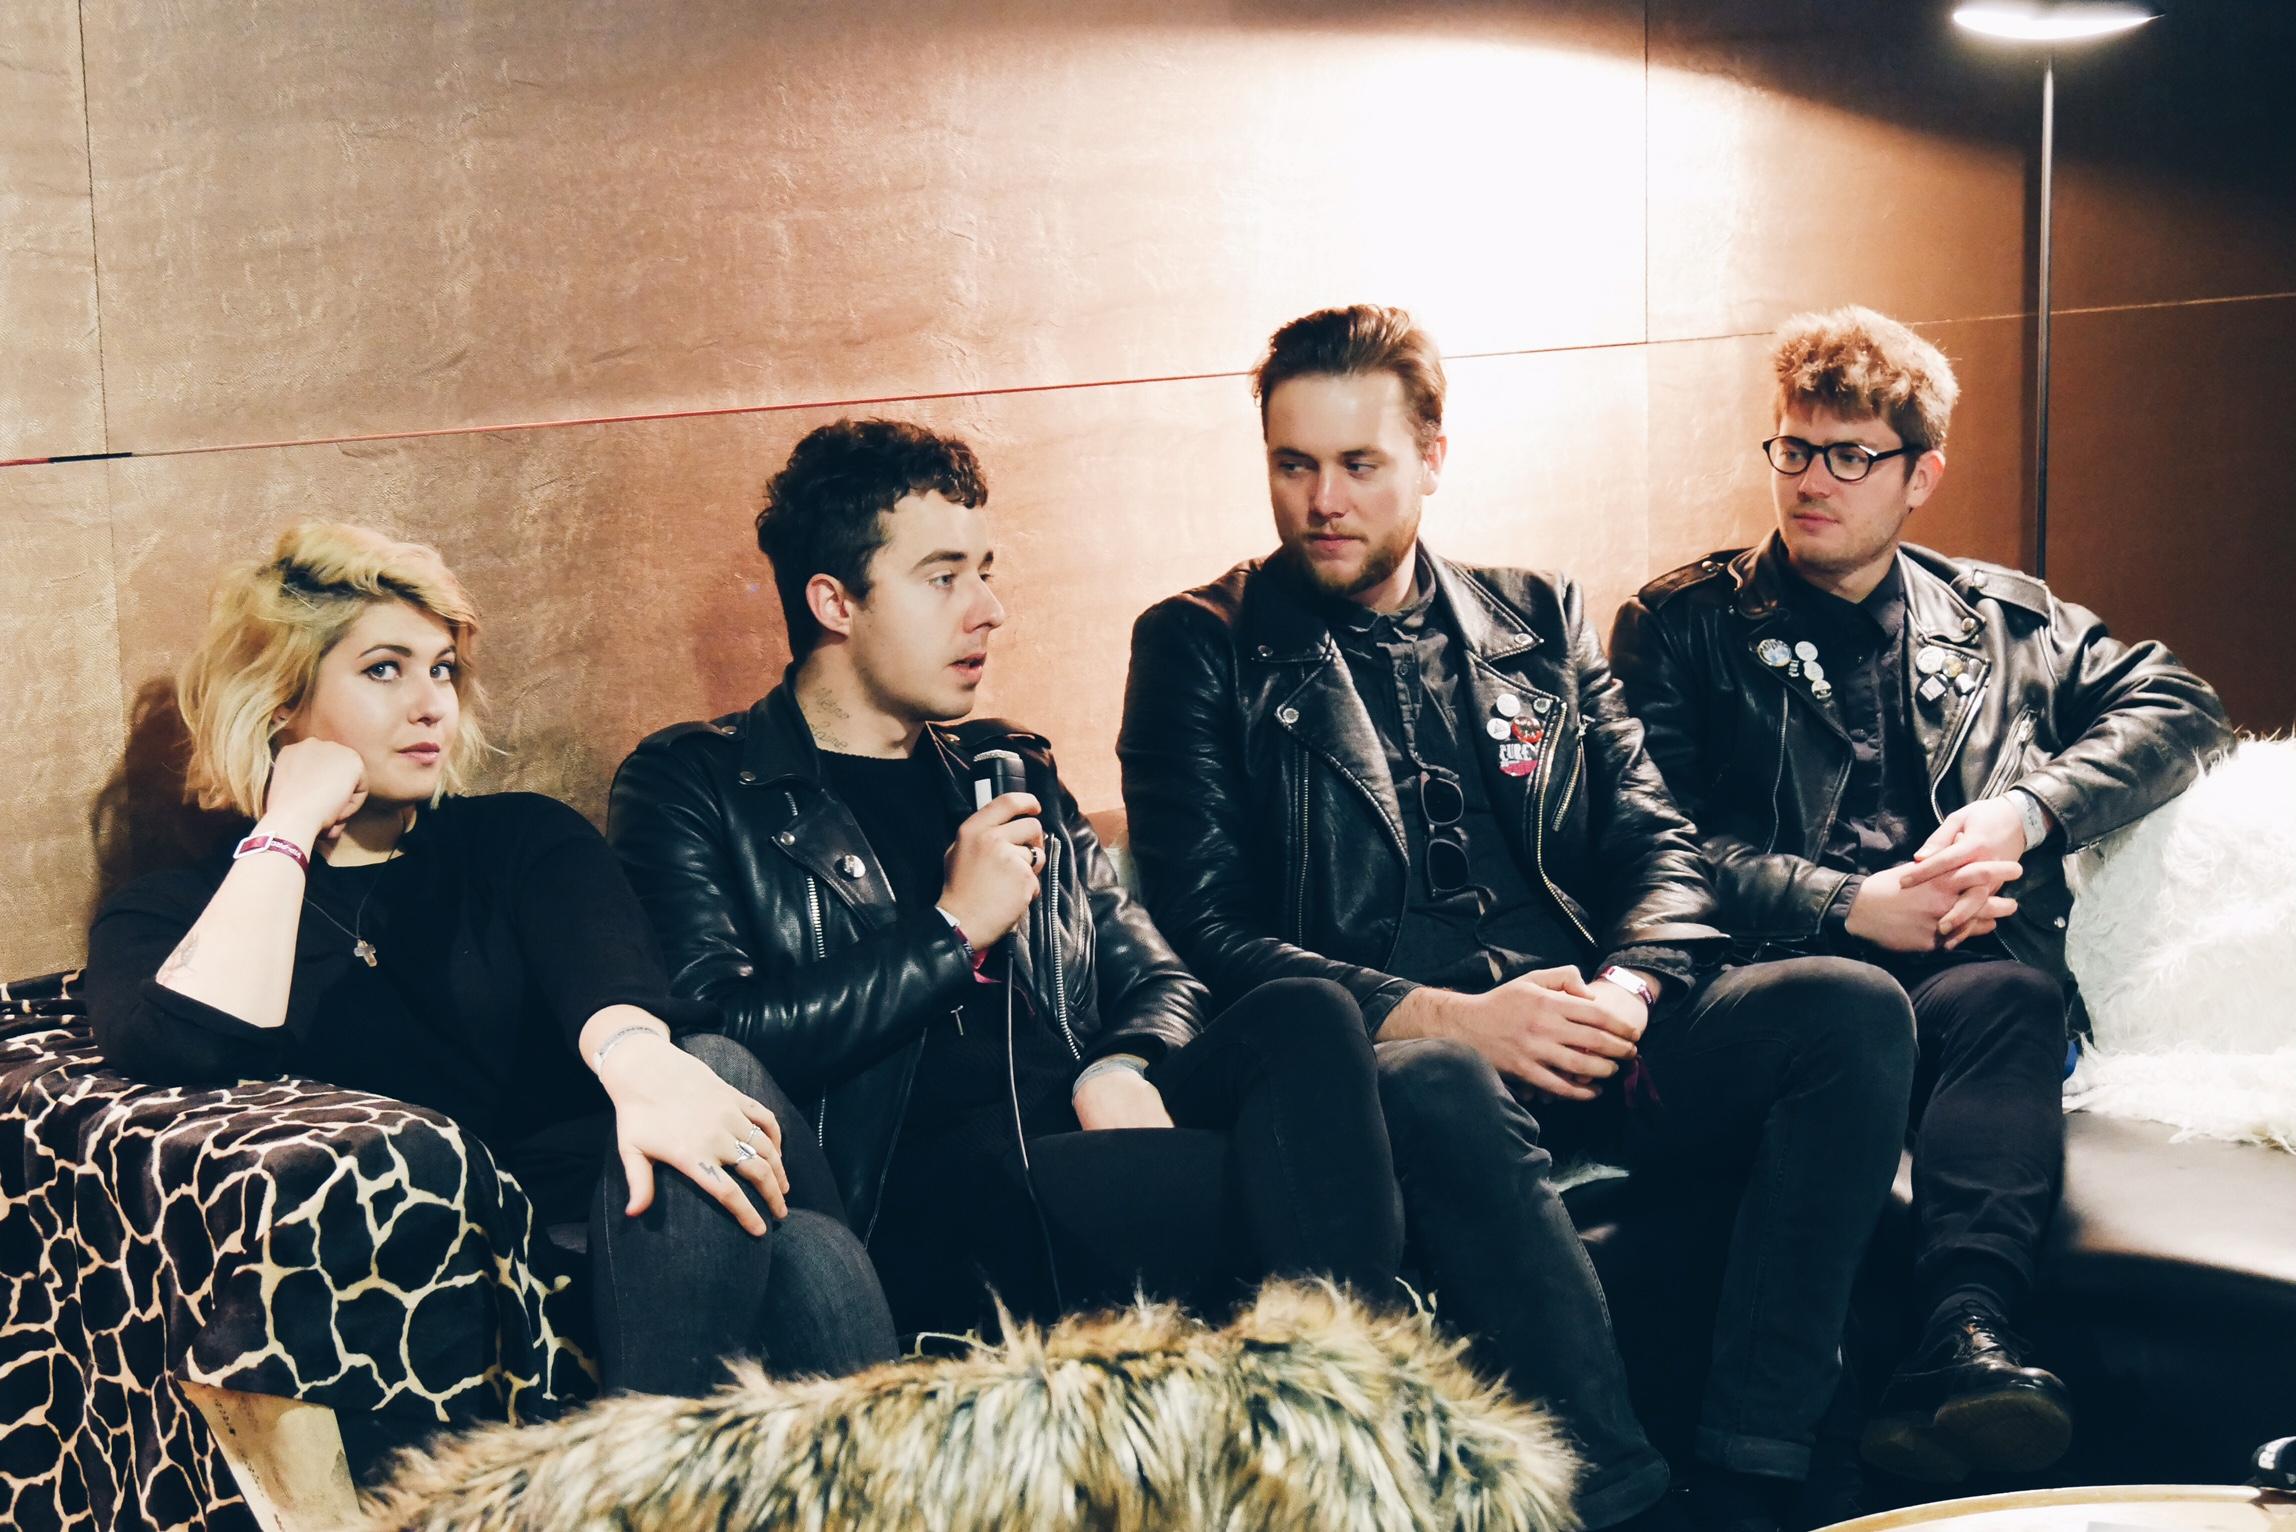 Metro-Verlaine-groupe-en-interview-concert-Trans-Musicales-2016-festival-photo-usofparis-blog